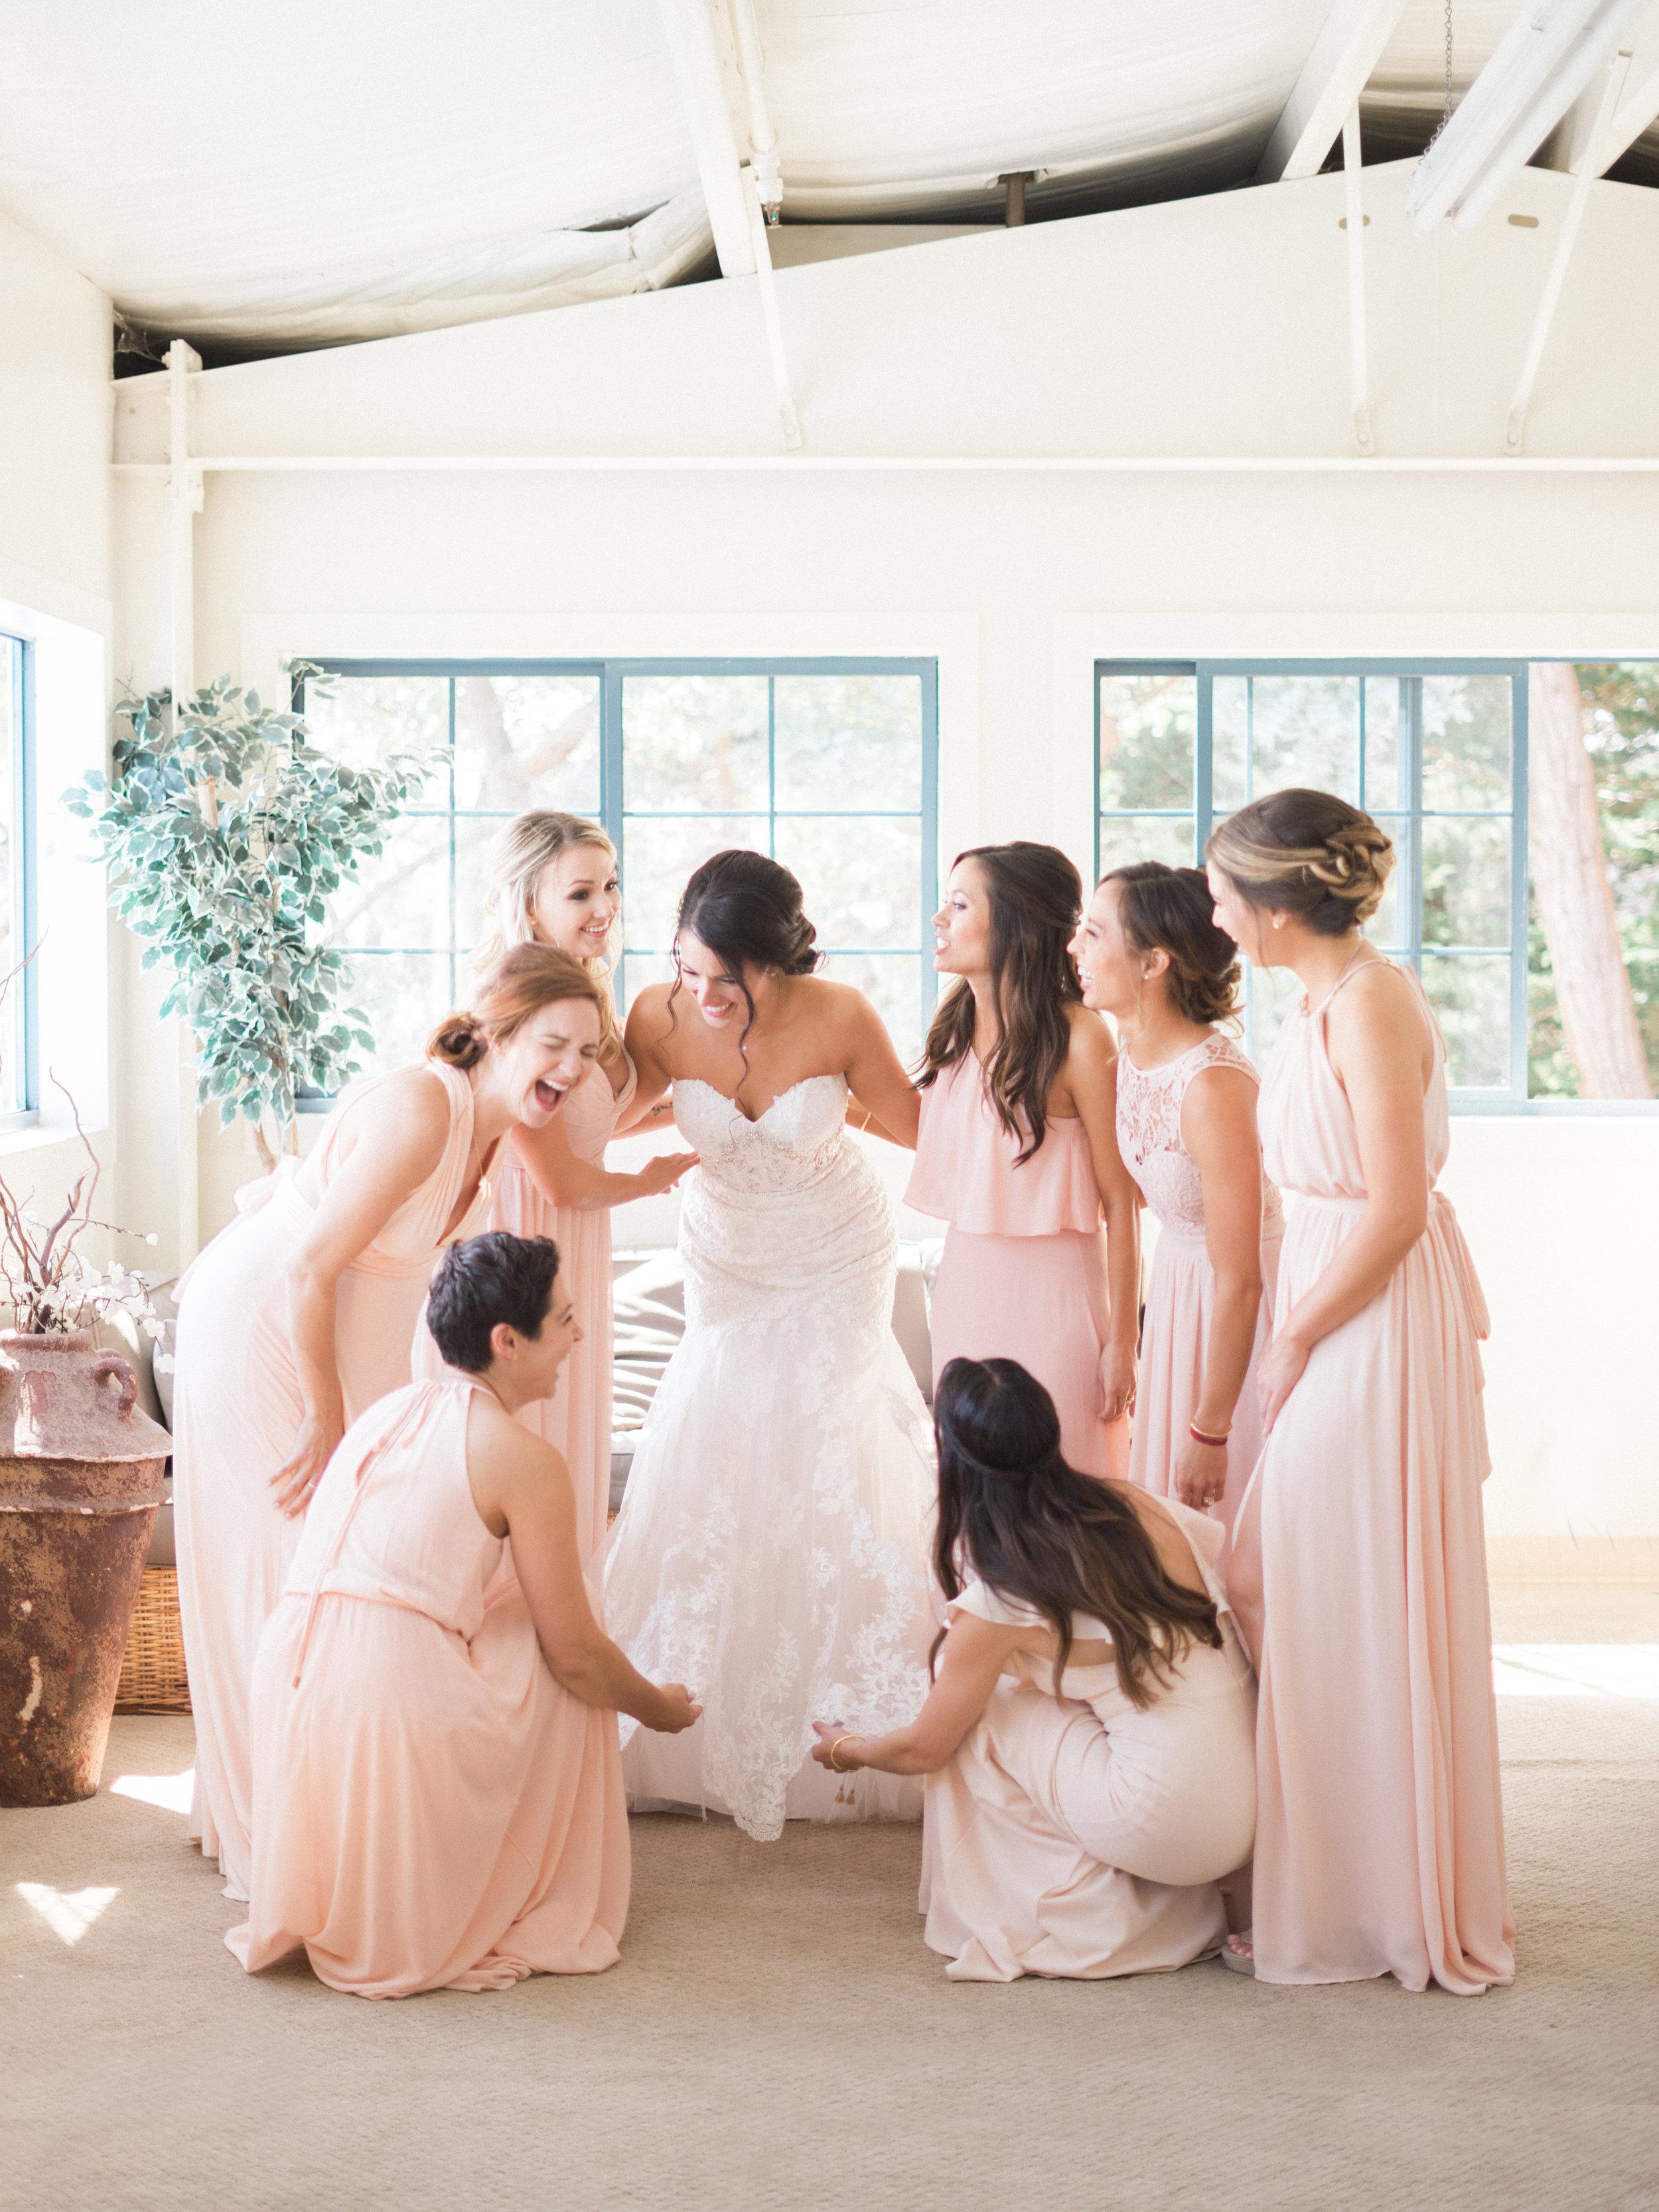 trynhphoto_socal_sf_halfmoon_bay_wedding_photographer_JA-67.jpg